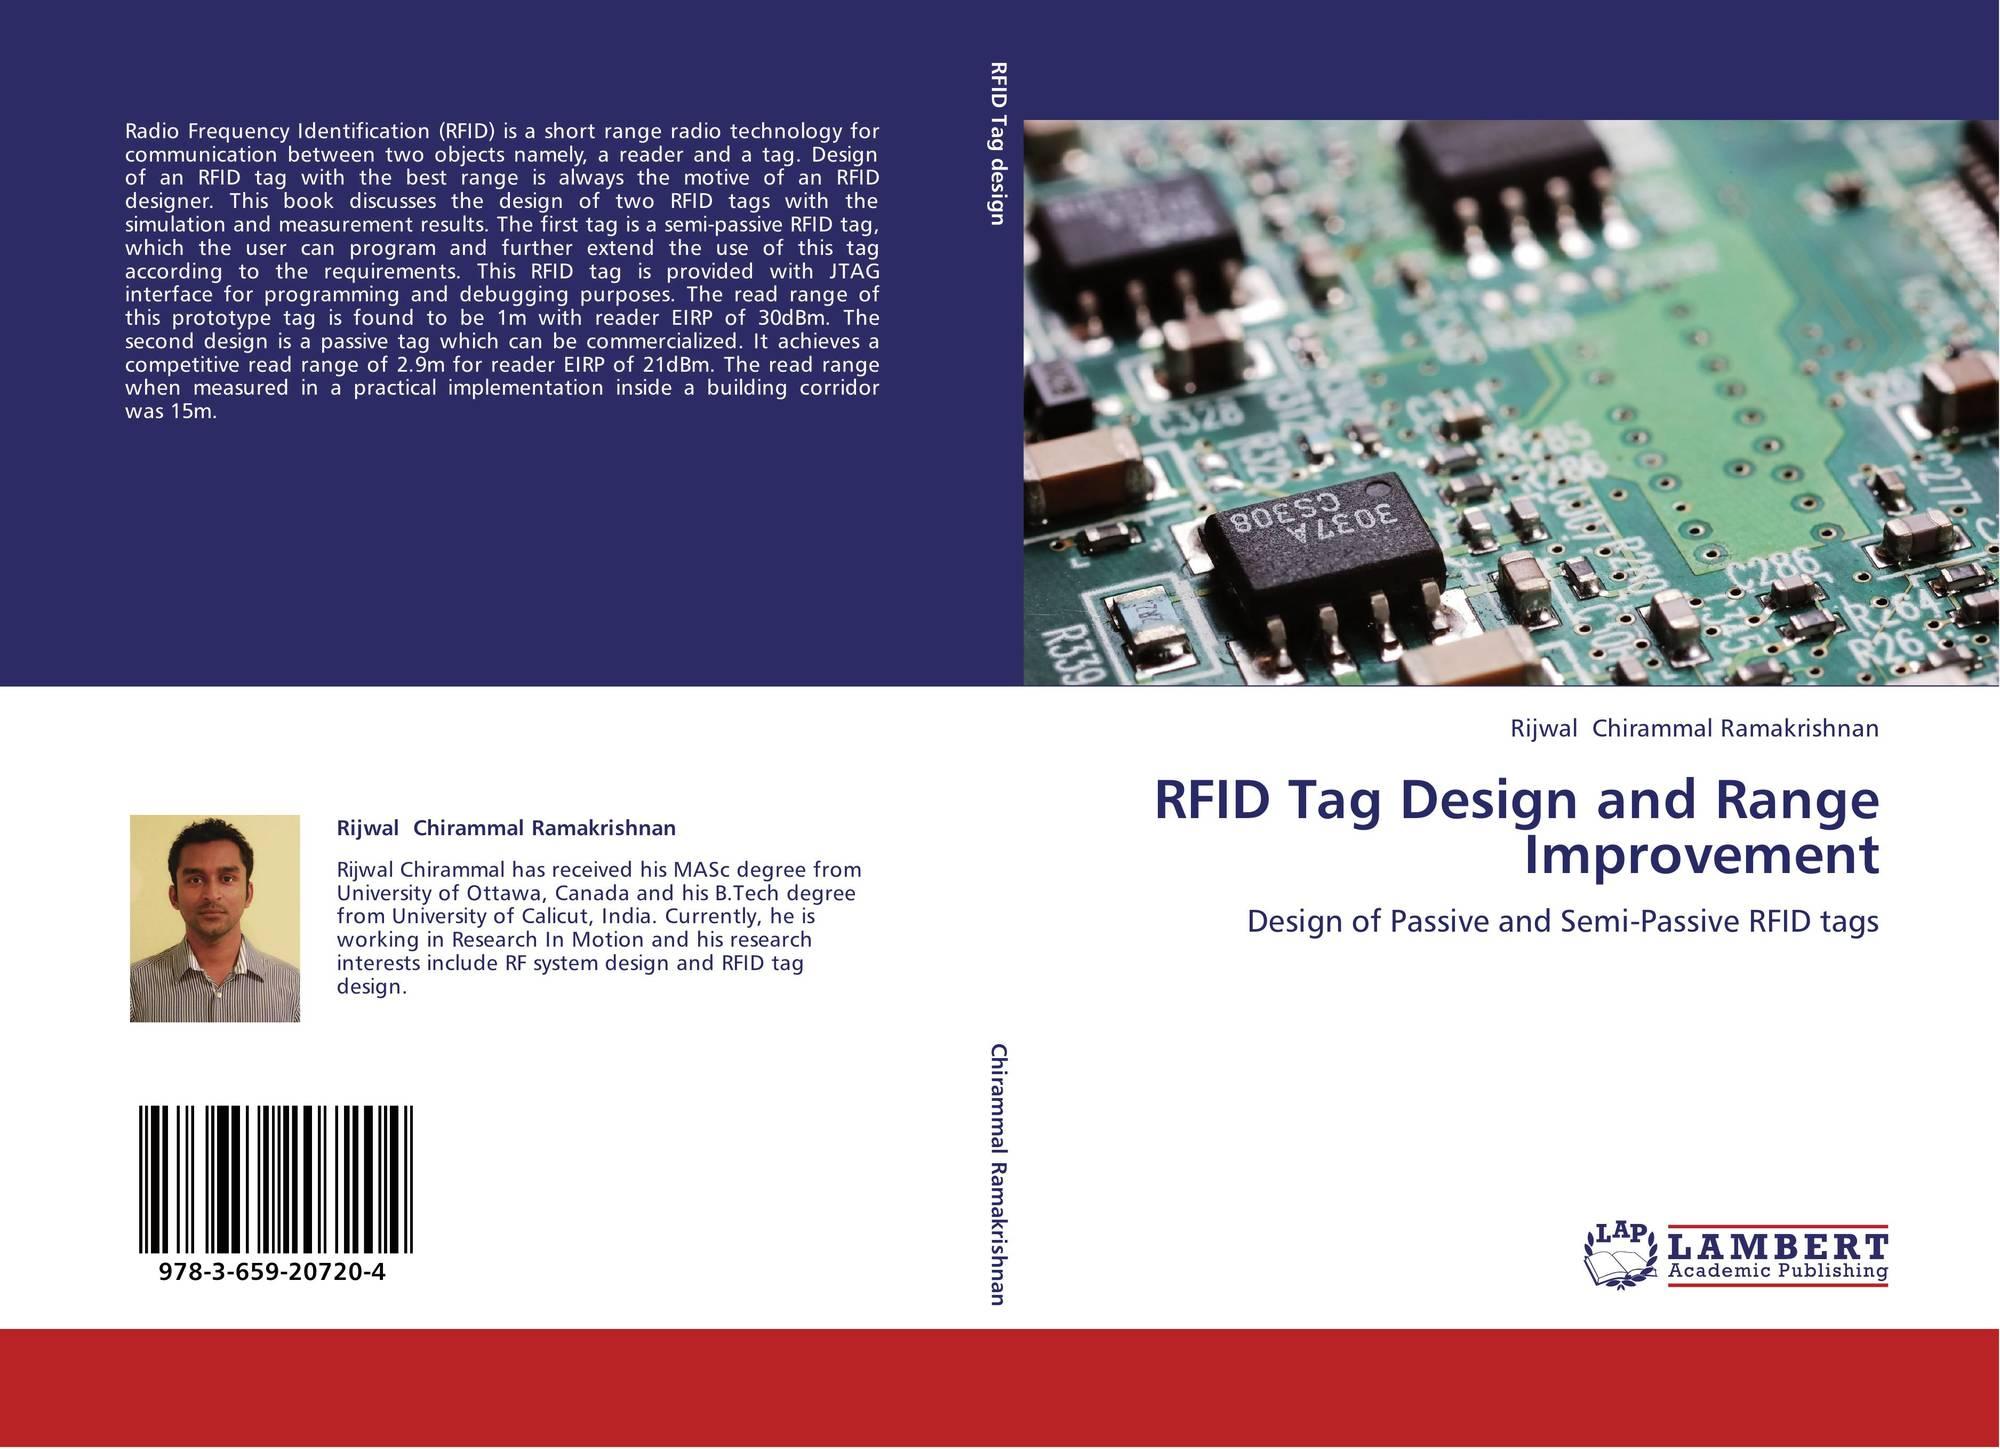 RFID Tag Design and Range Improvement, 978-3-659-20720-4